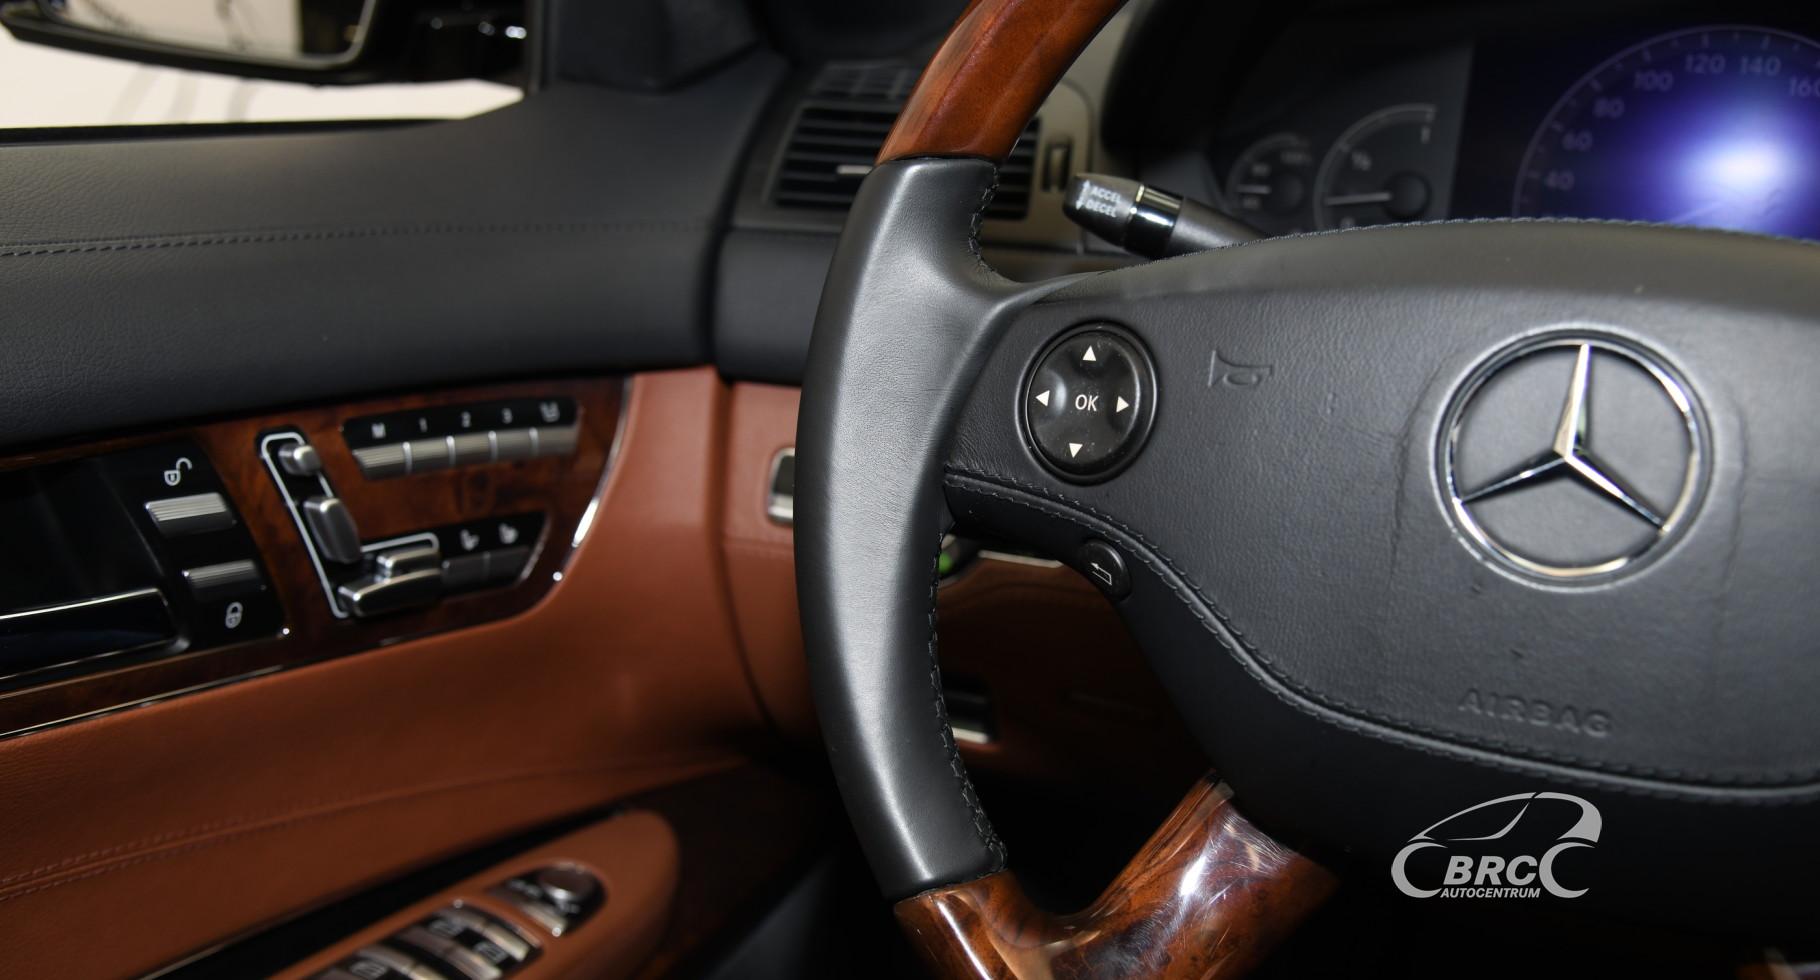 Mercedes-Benz CL 550 Automatas